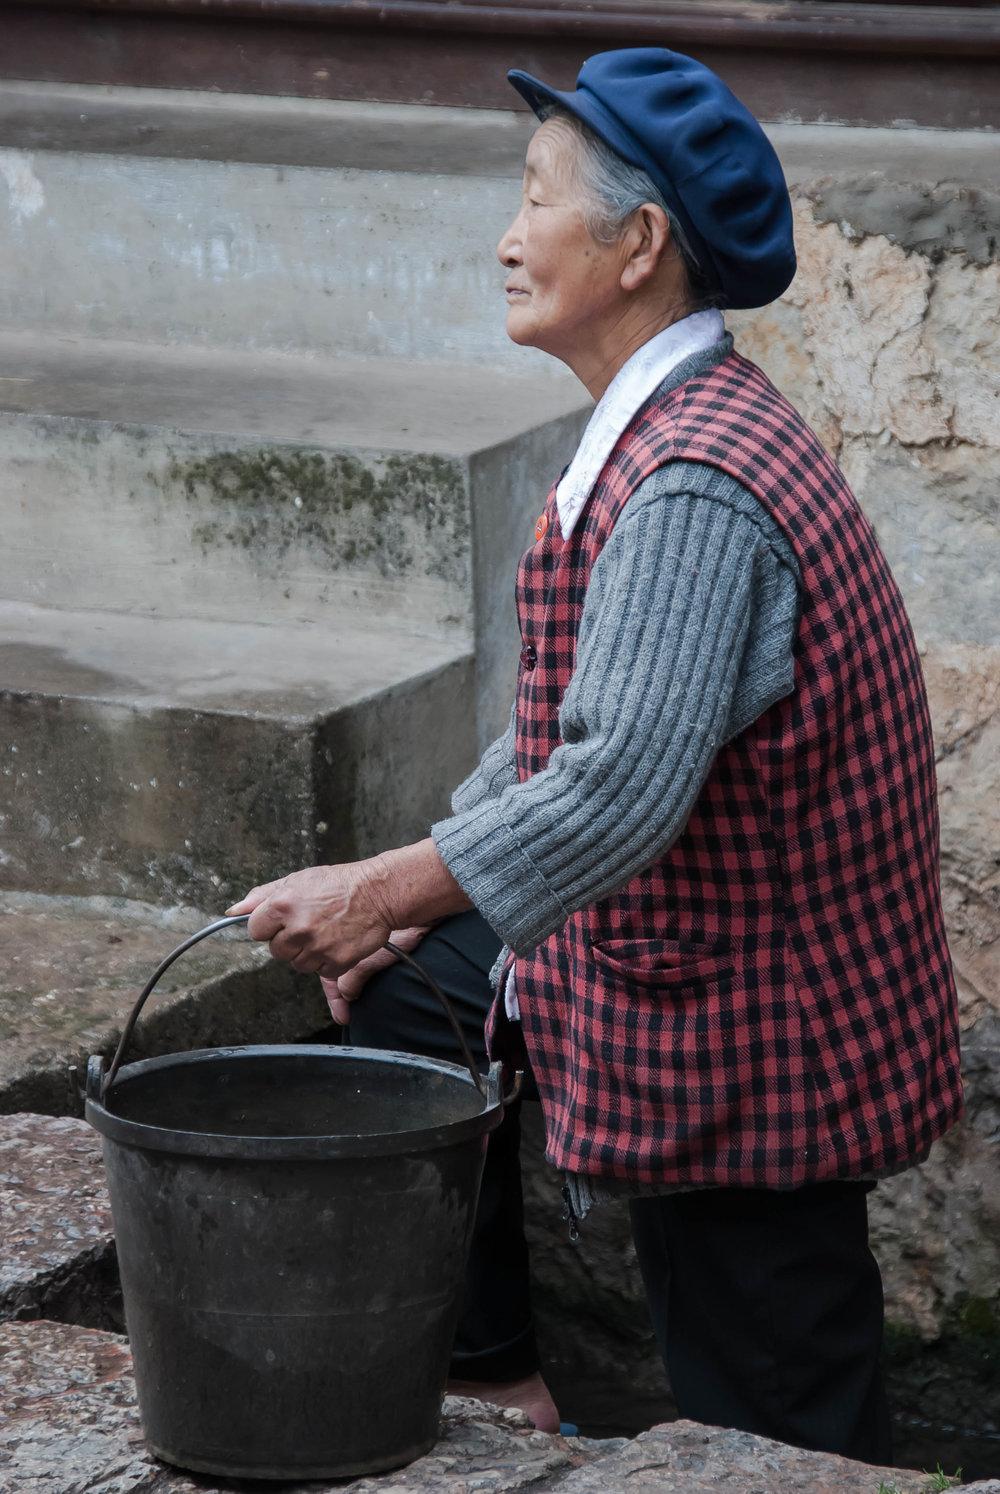 2008_06-26 Old Woman Fetching Water Lijiang Yunnan China_.jpg